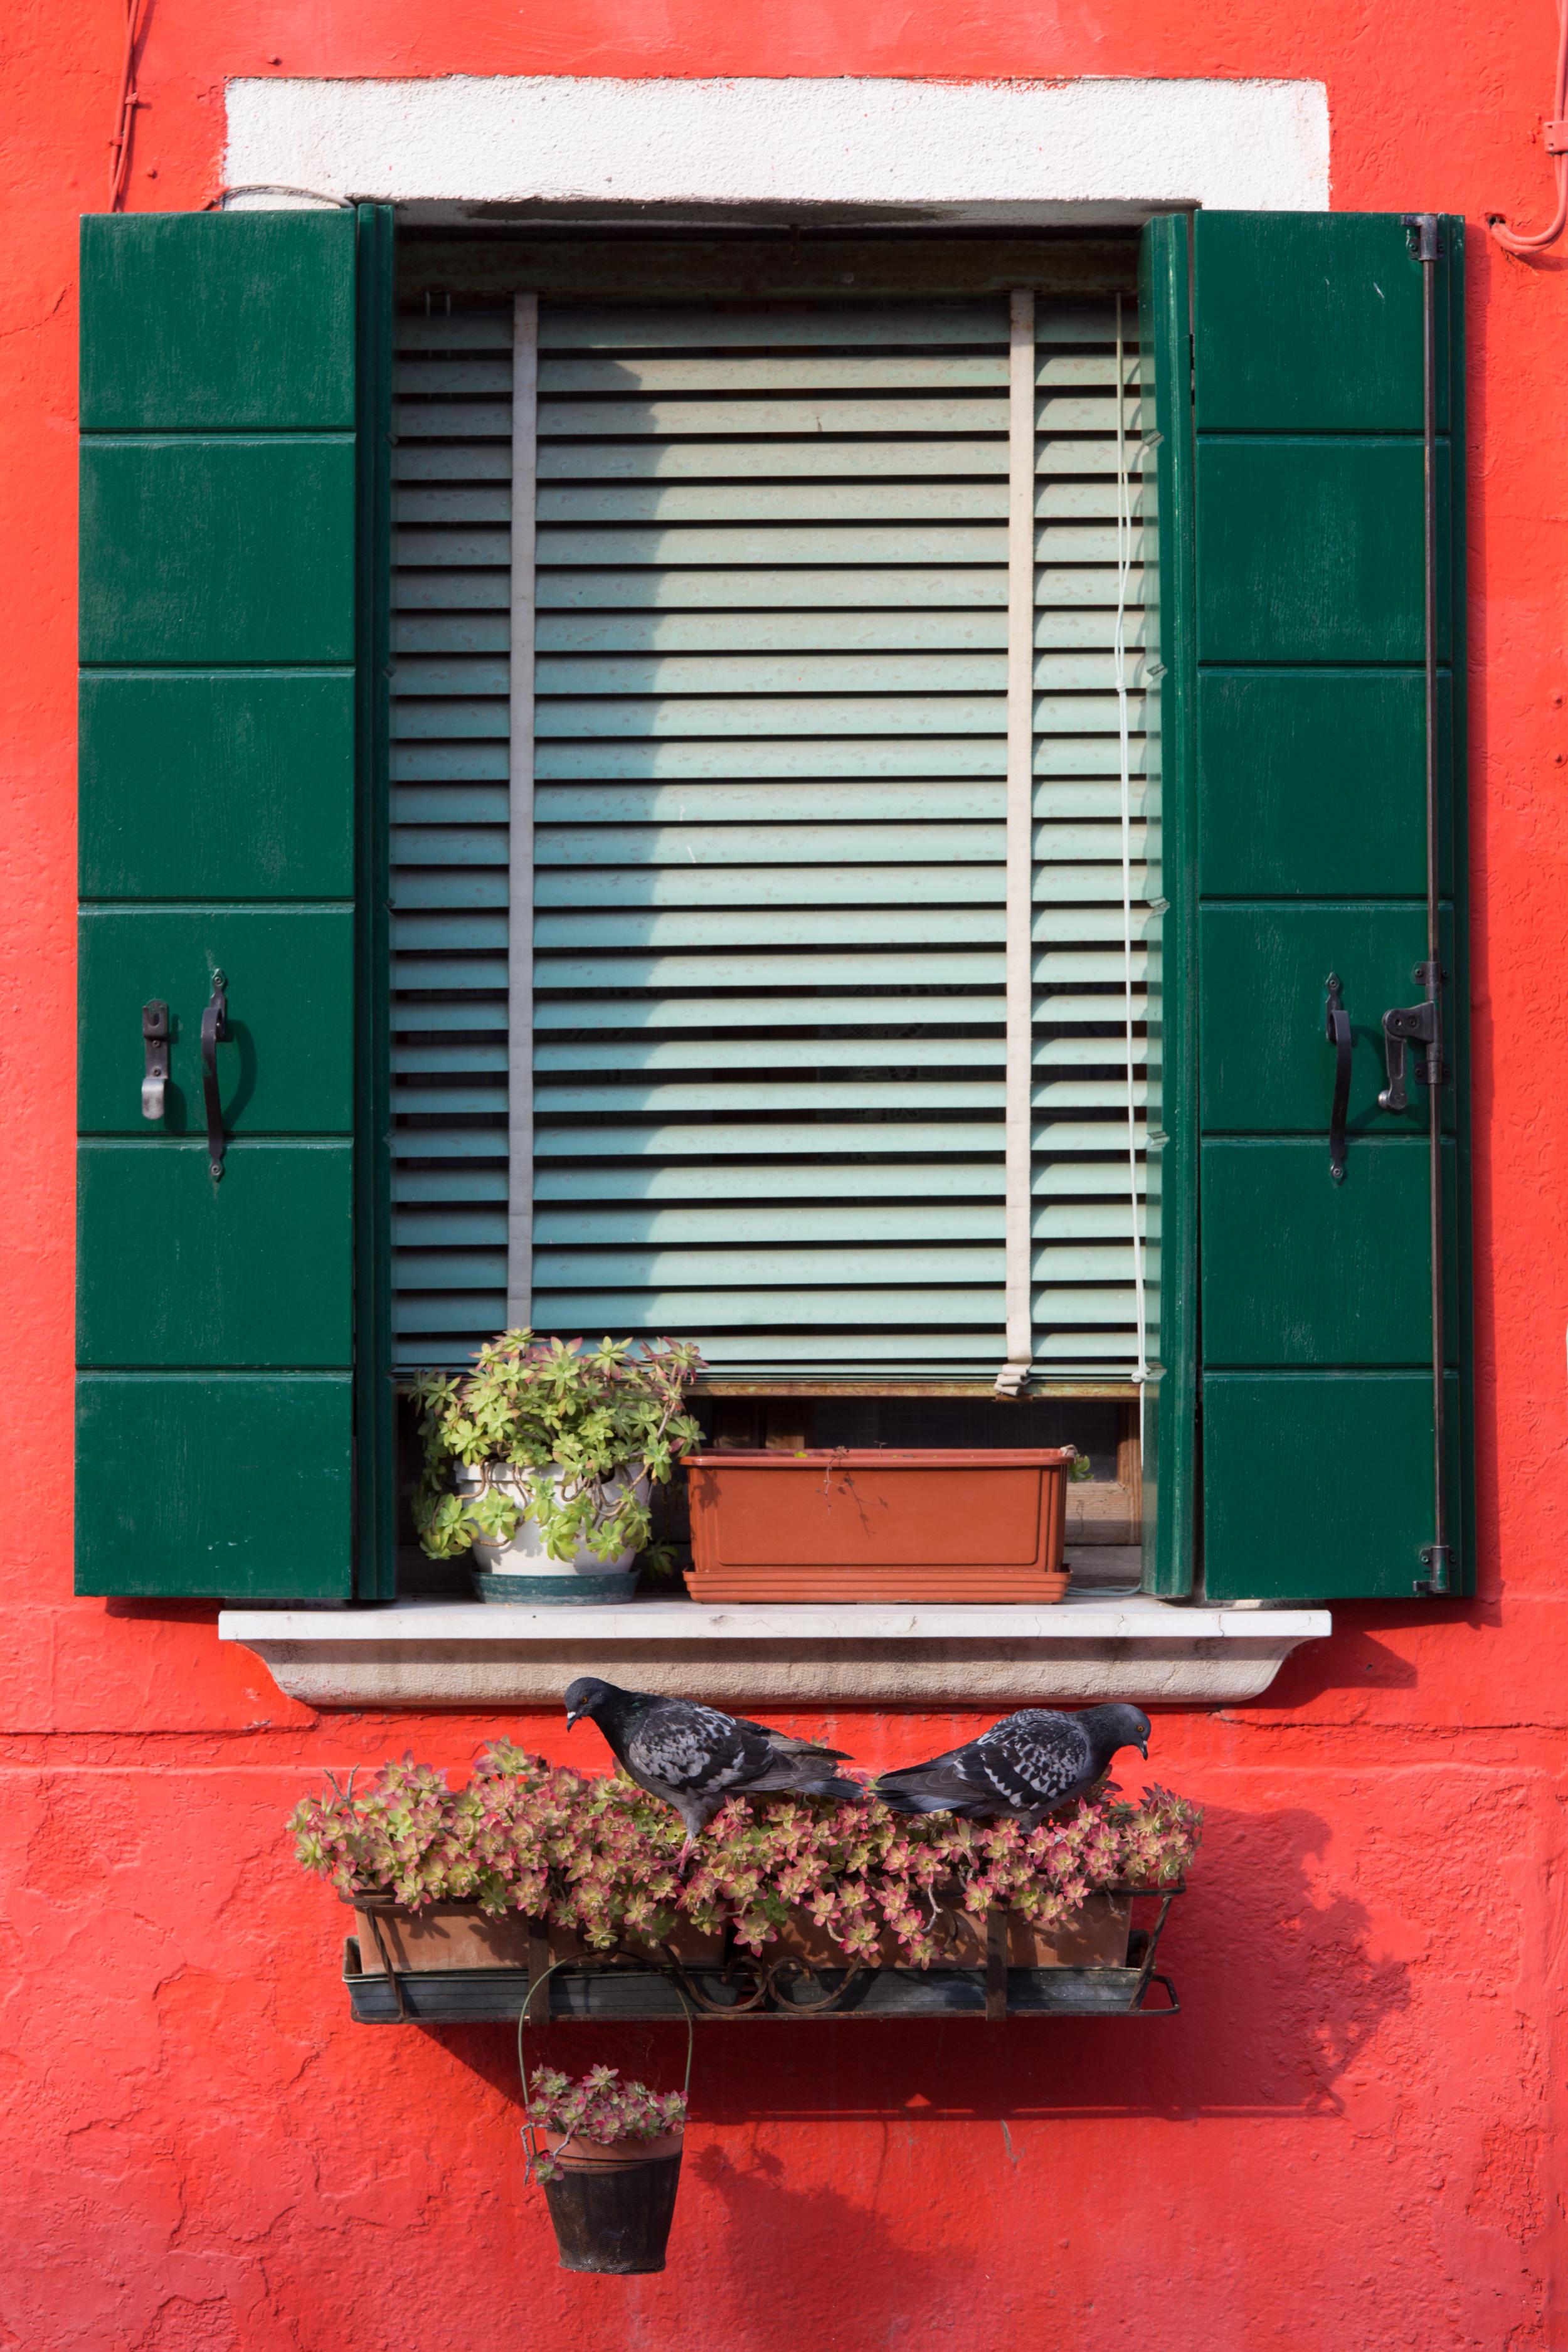 Window on the Island of Burano - 6d - 70-200 f4 @ 165mm/ f7.1/ 1/125 sec/ iso100